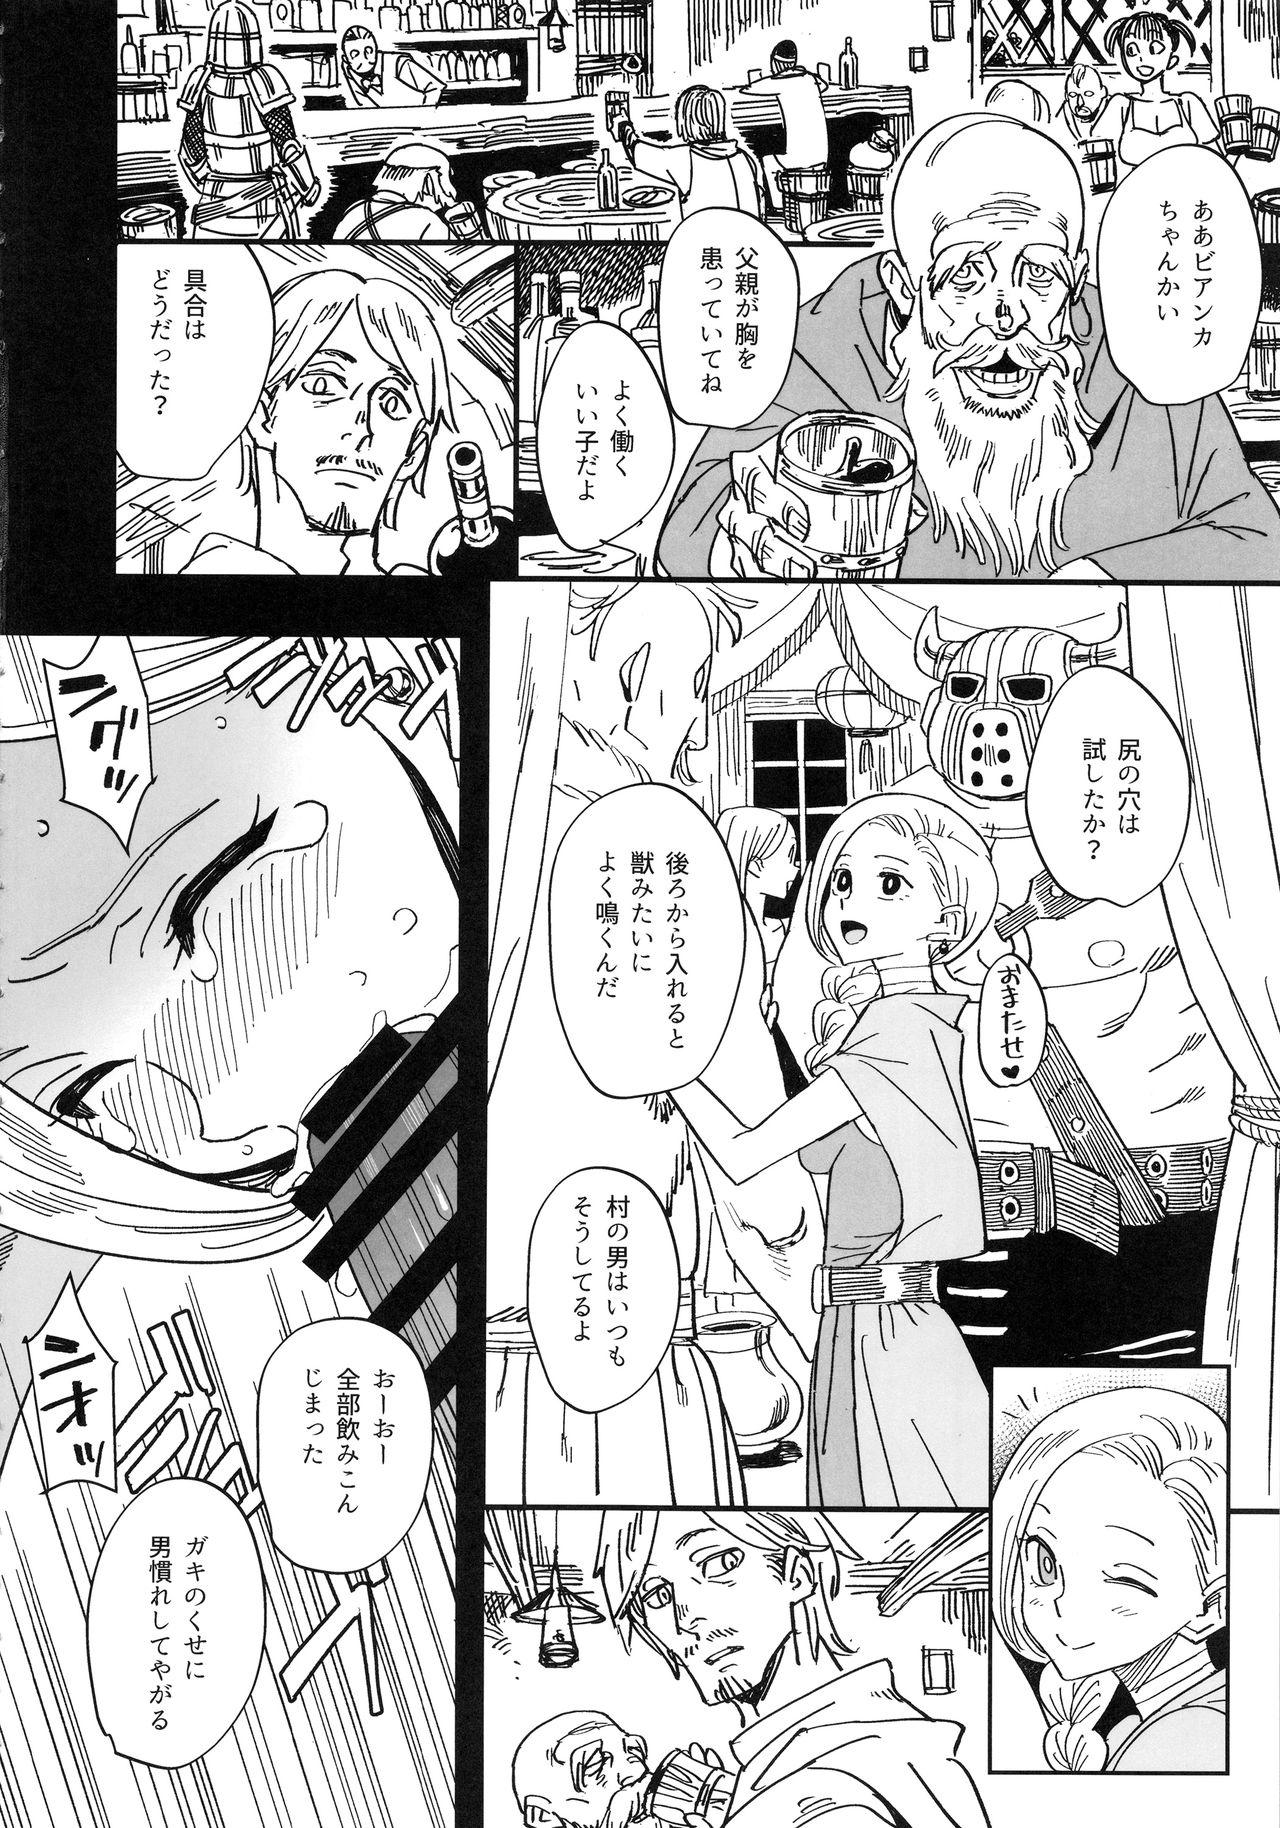 Mamono no Hanayome - Devil's Bride 4